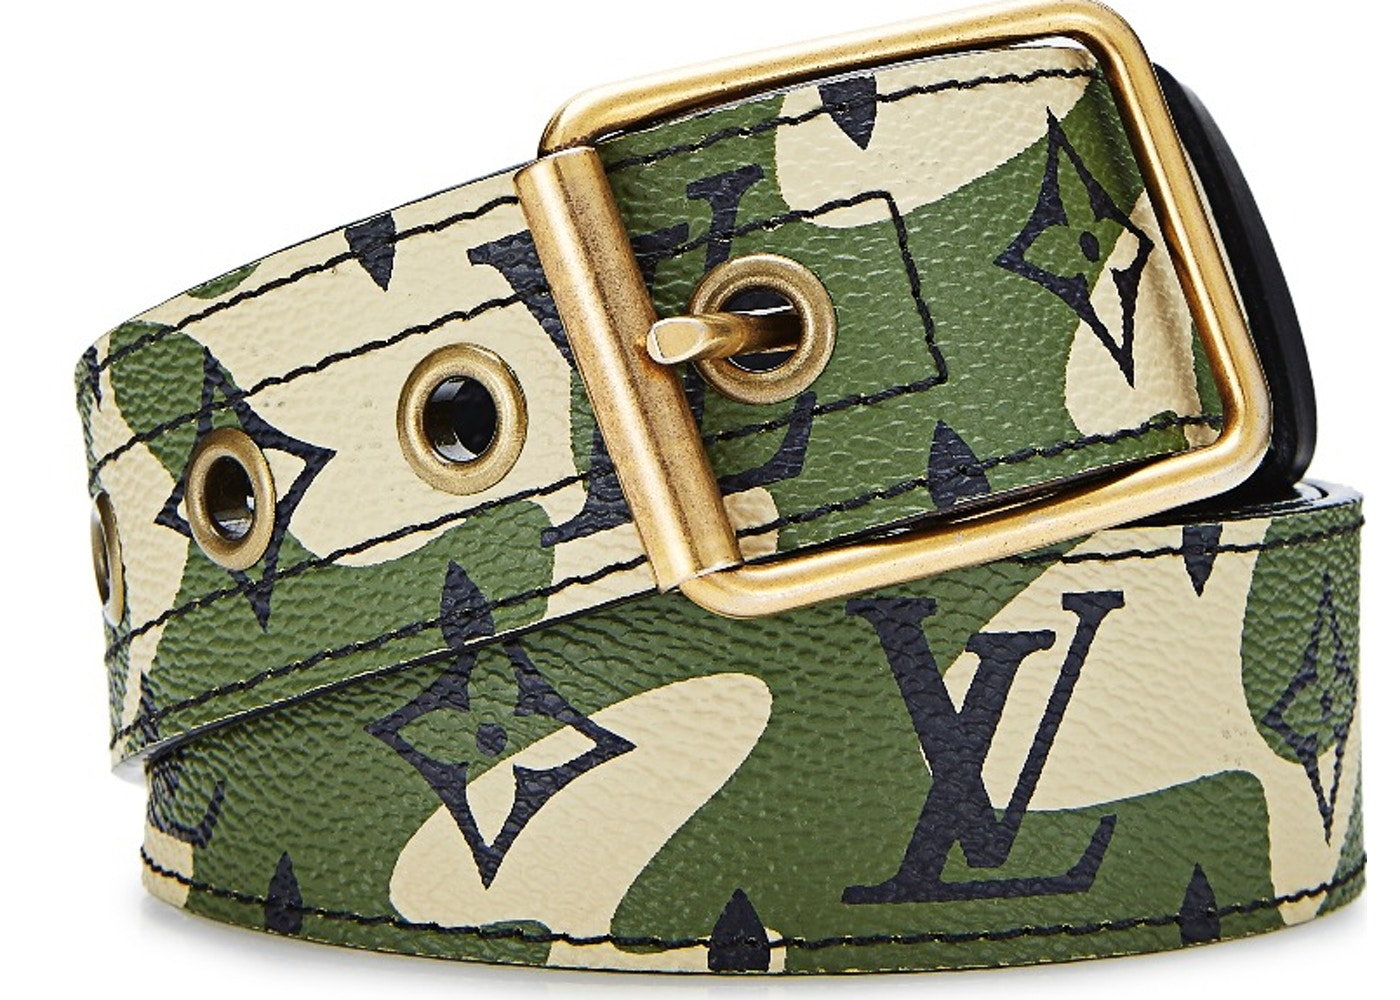 8f05f5d768aa Louis Vuitton x Takashi Murakami Belt Monogramouflage Green. Monogramouflage  Green